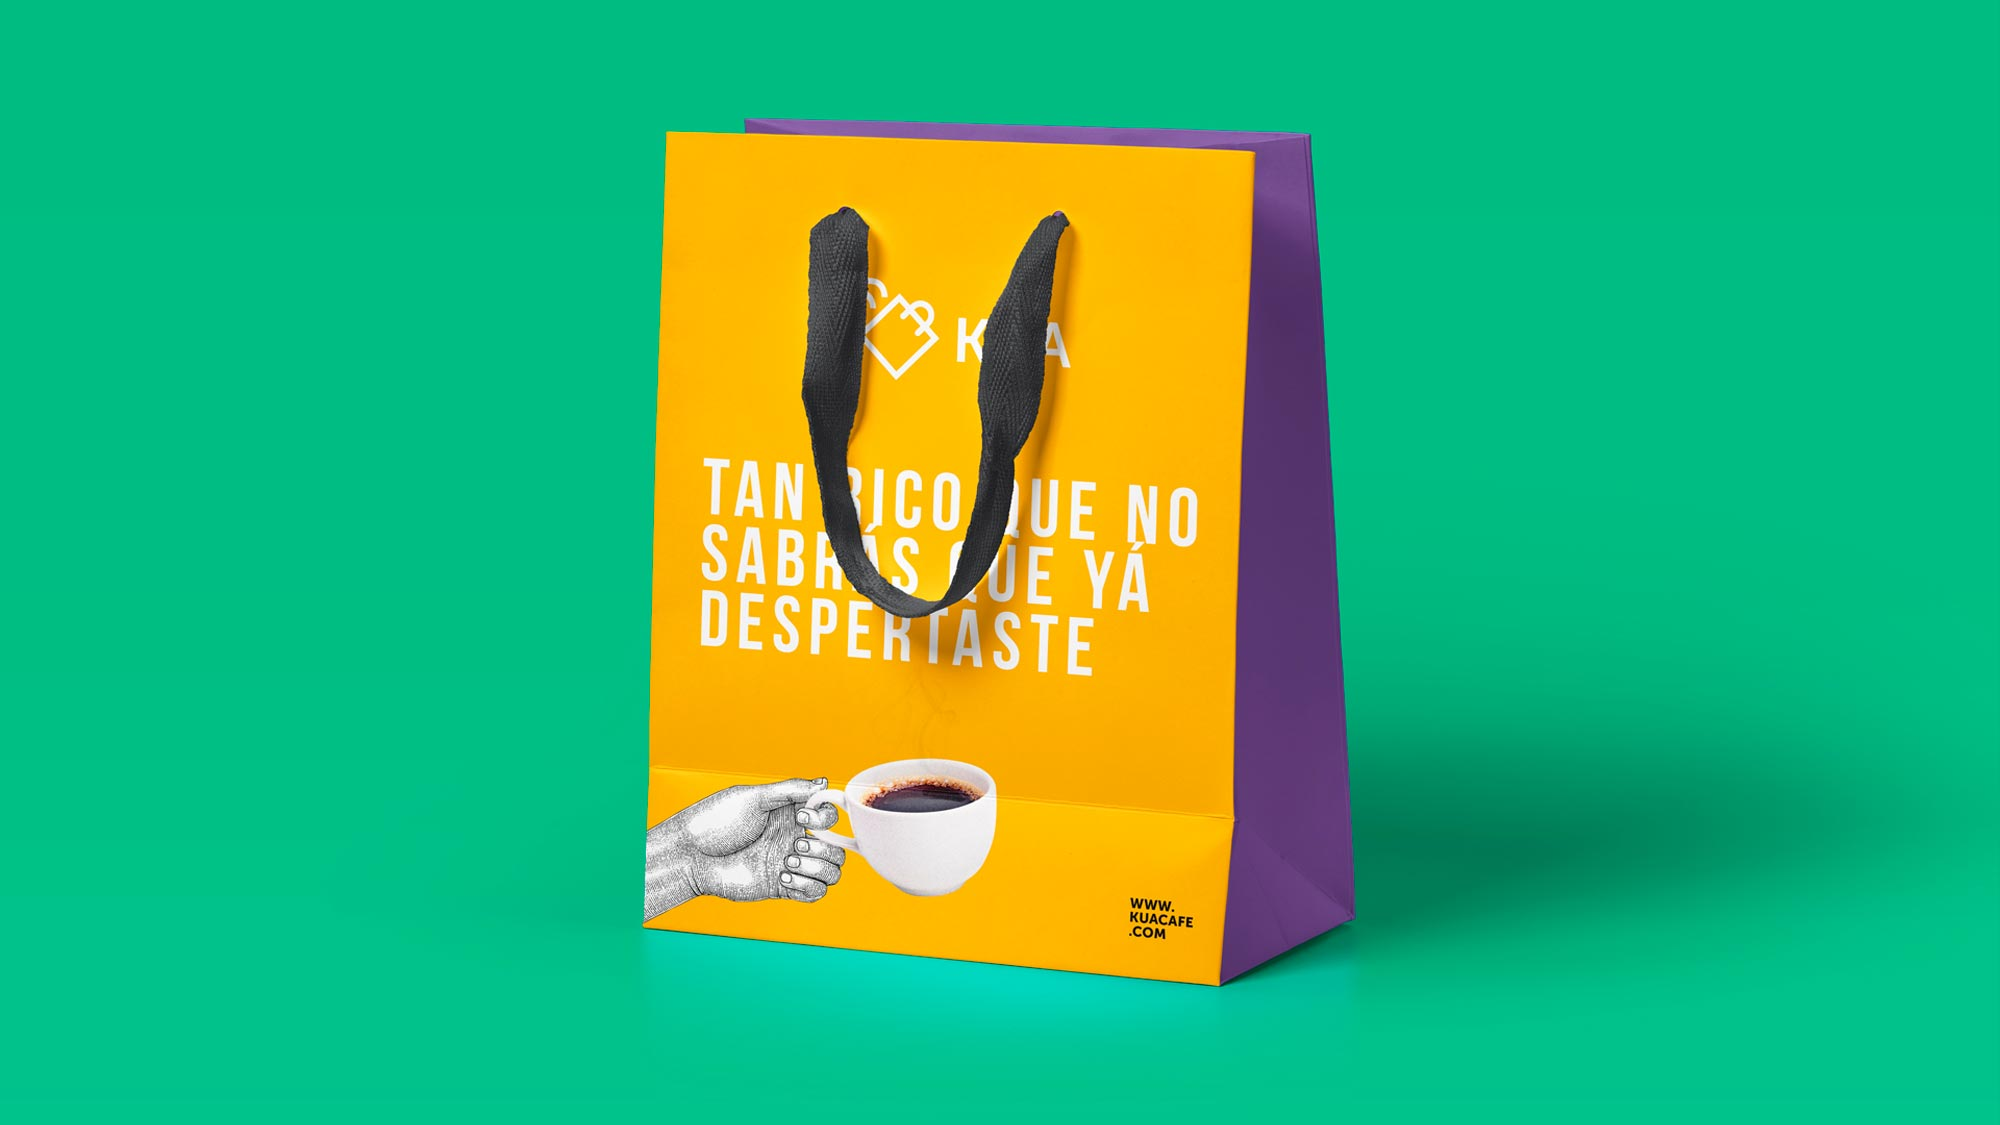 boom-agencia-marketing-digital-branding-kua-cafe-tienda-online-logo-bolsa-brandeada